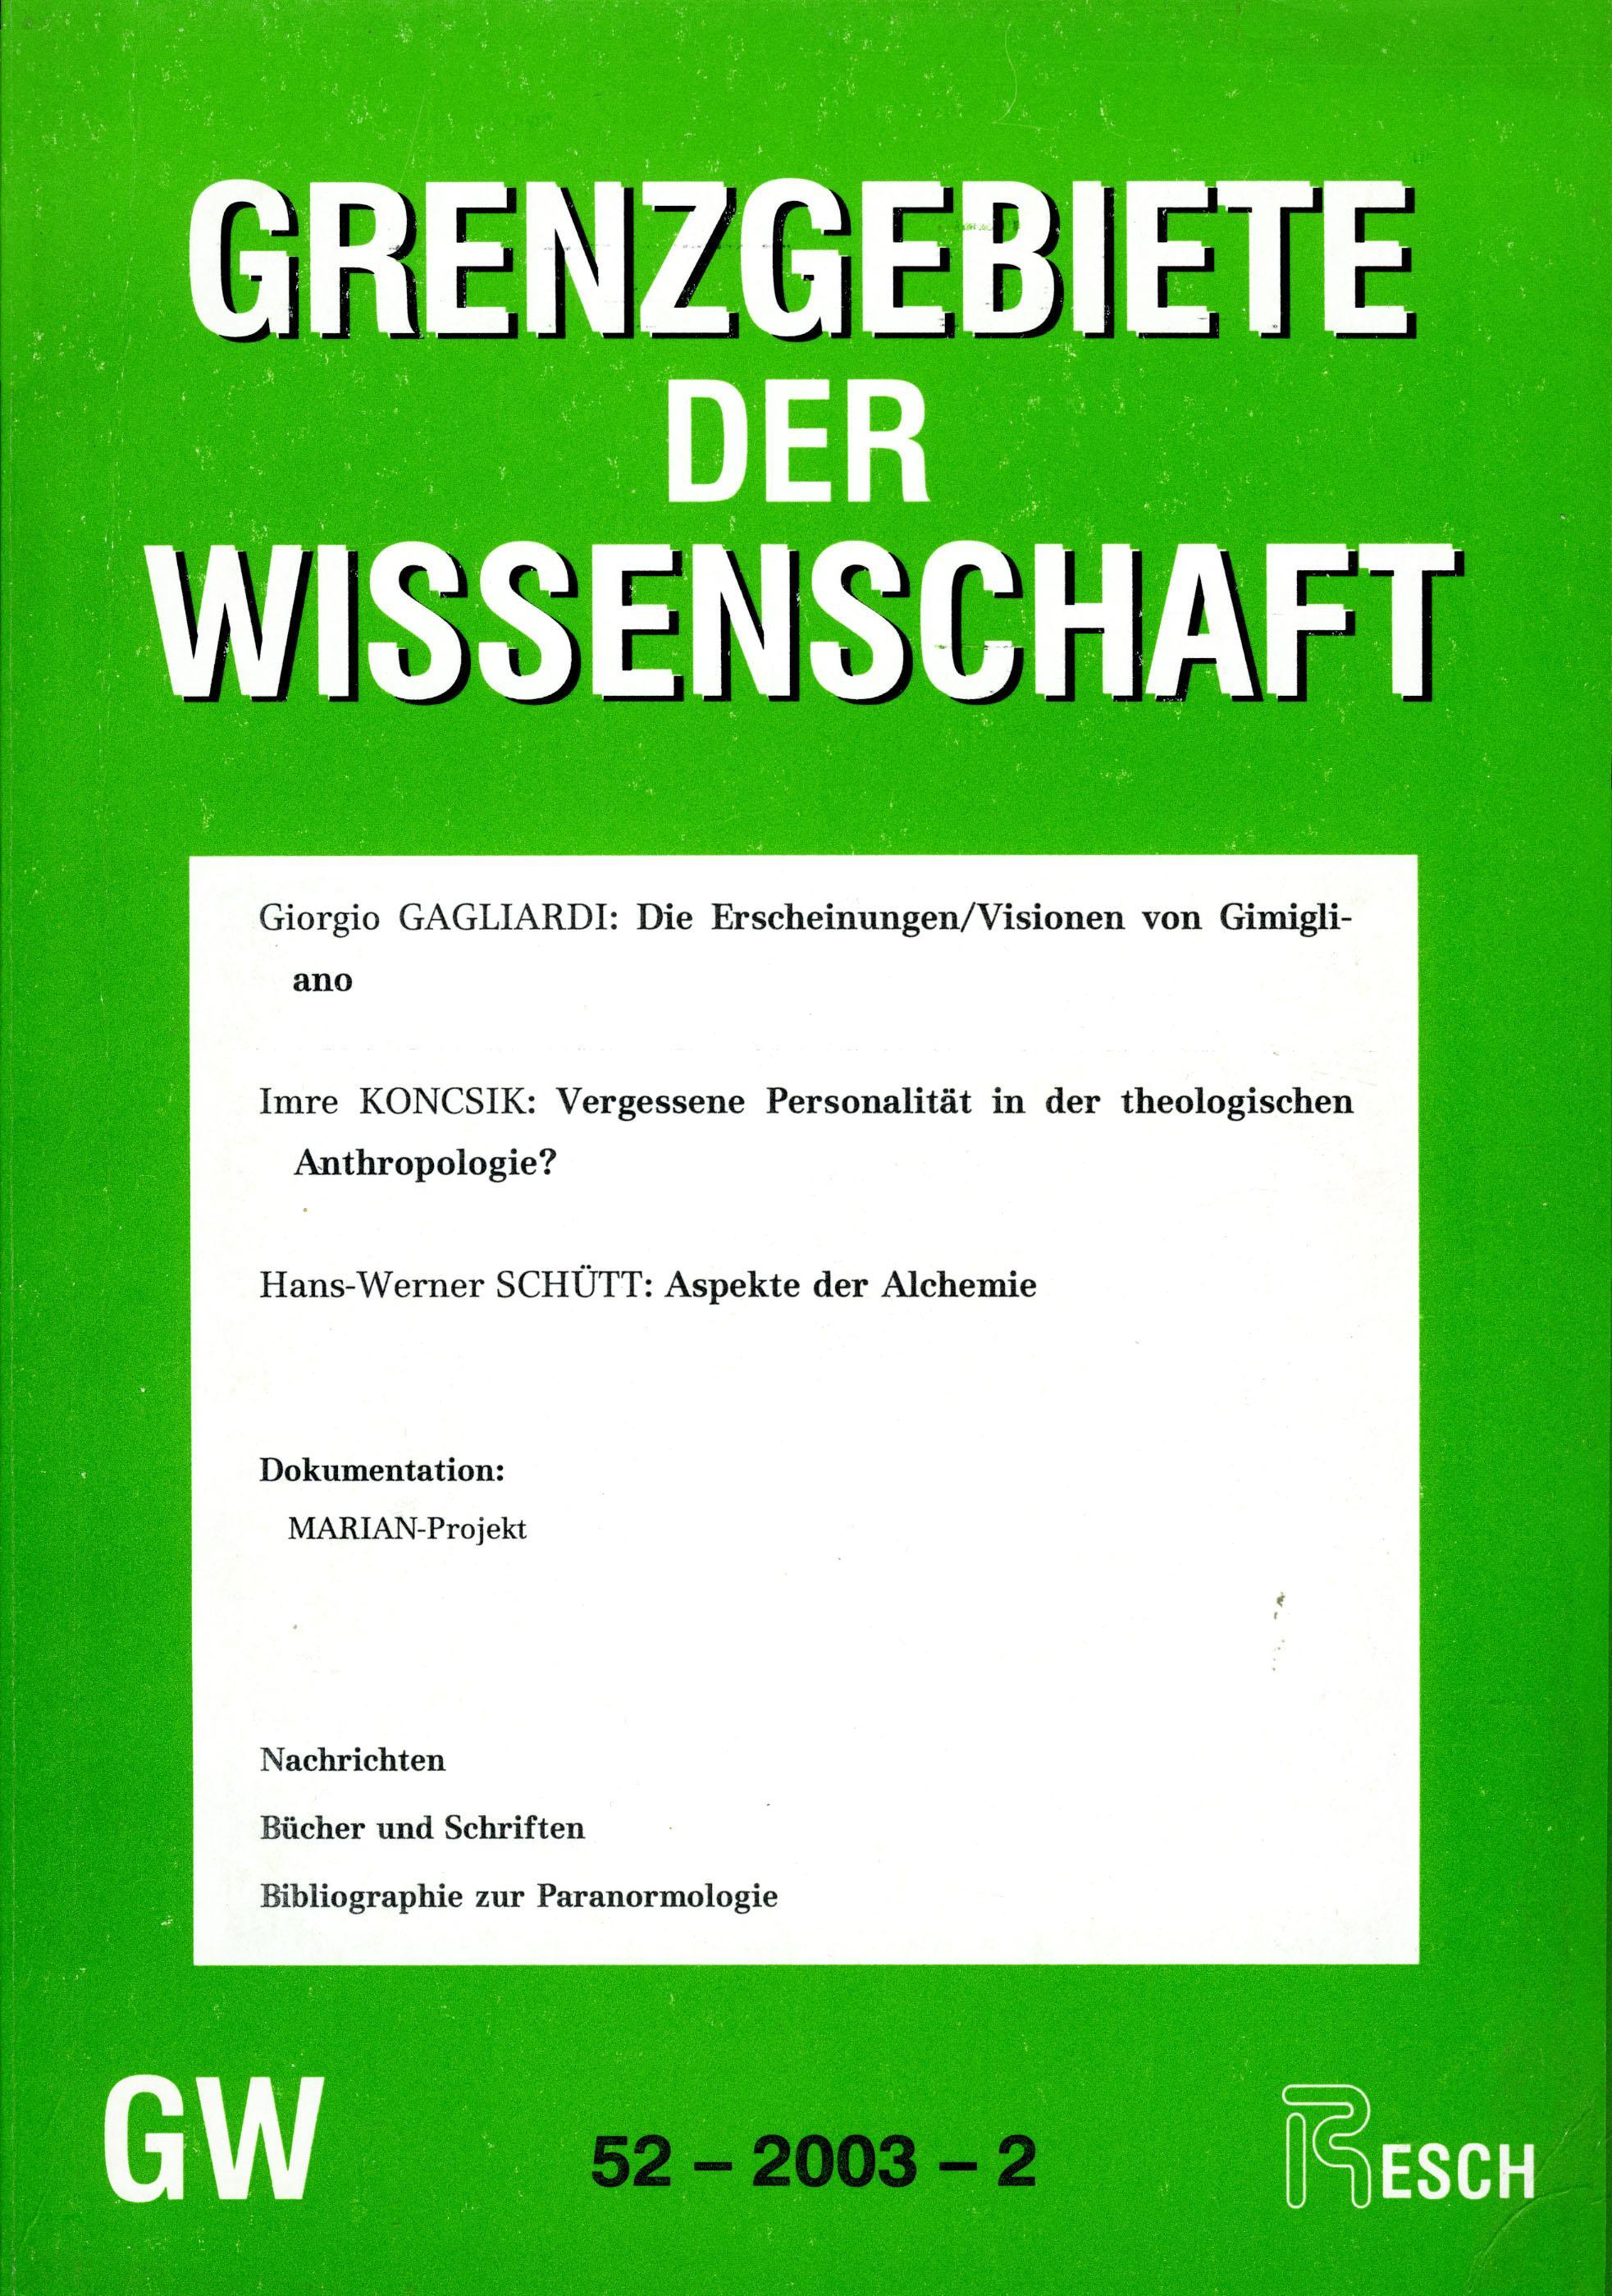 GW_2003_2